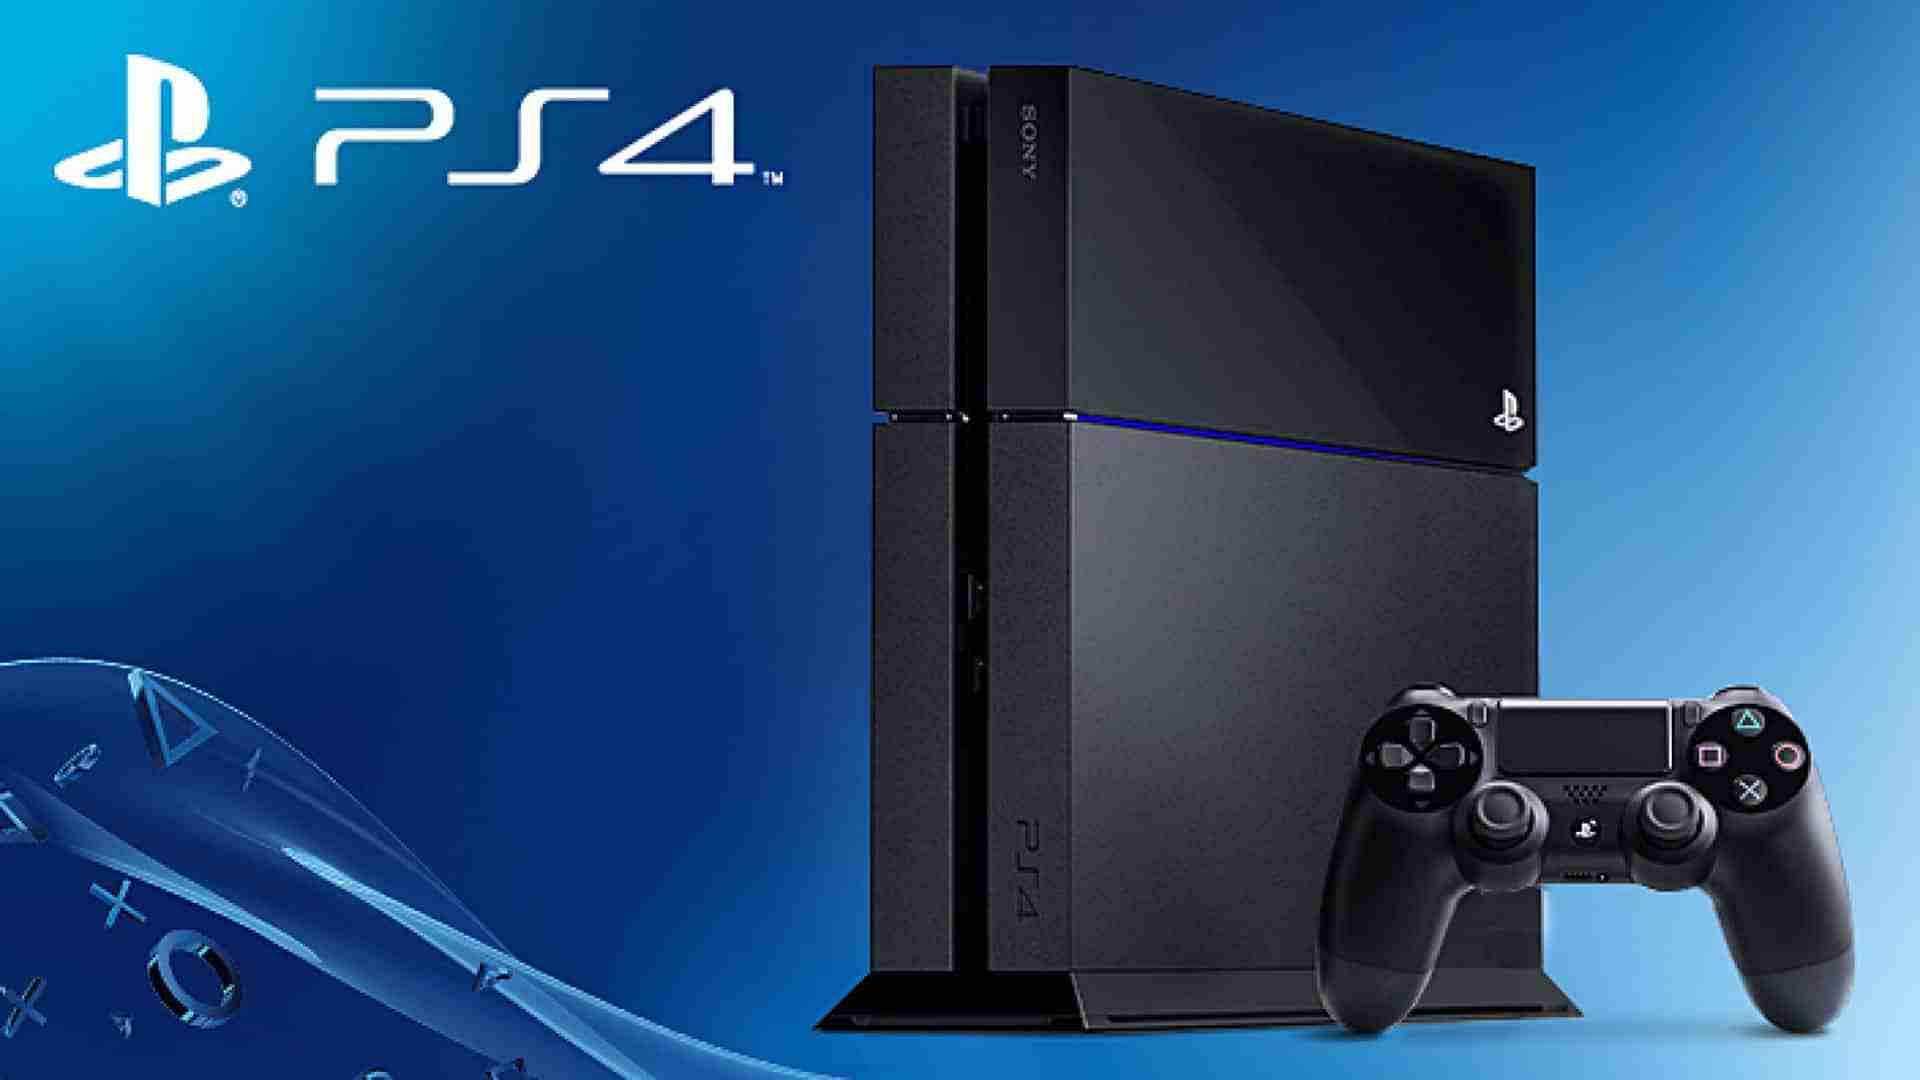 Daftar Harga PS4